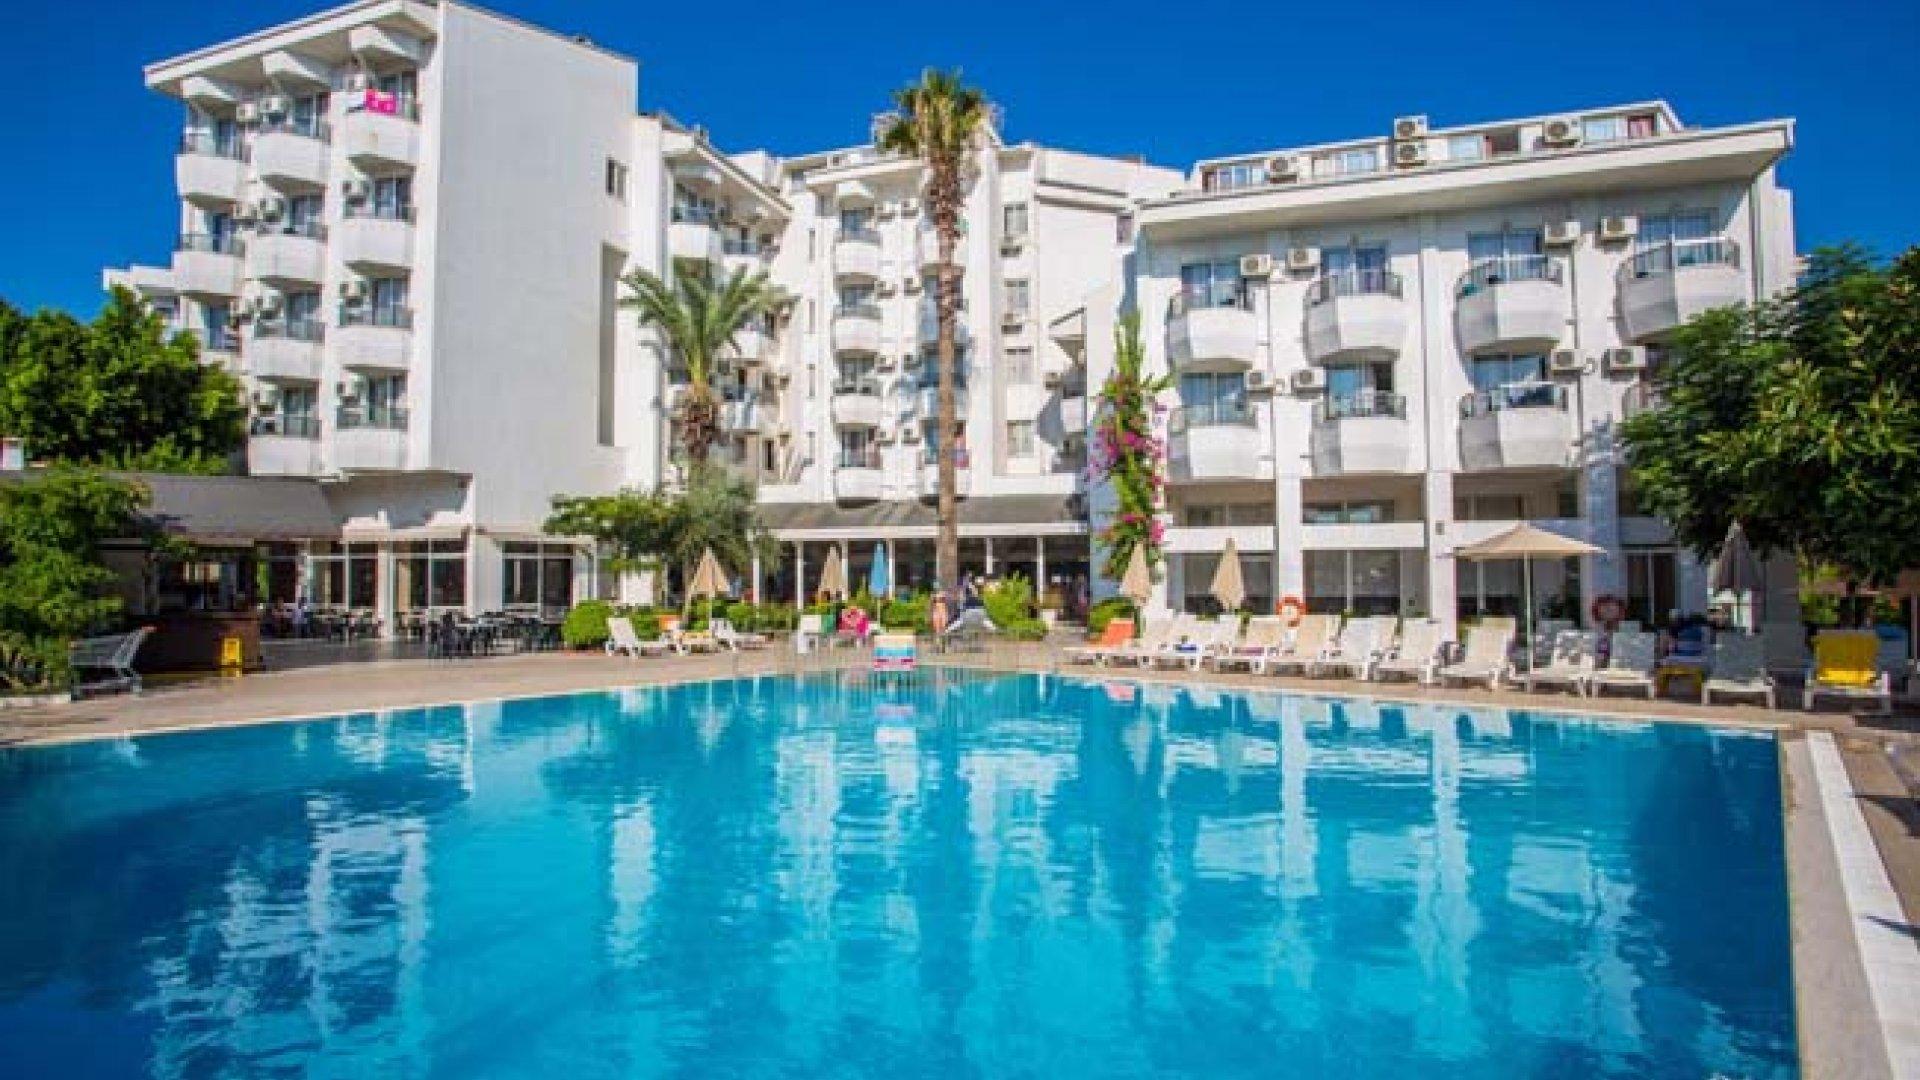 Sonnen Hotel - Marmaris